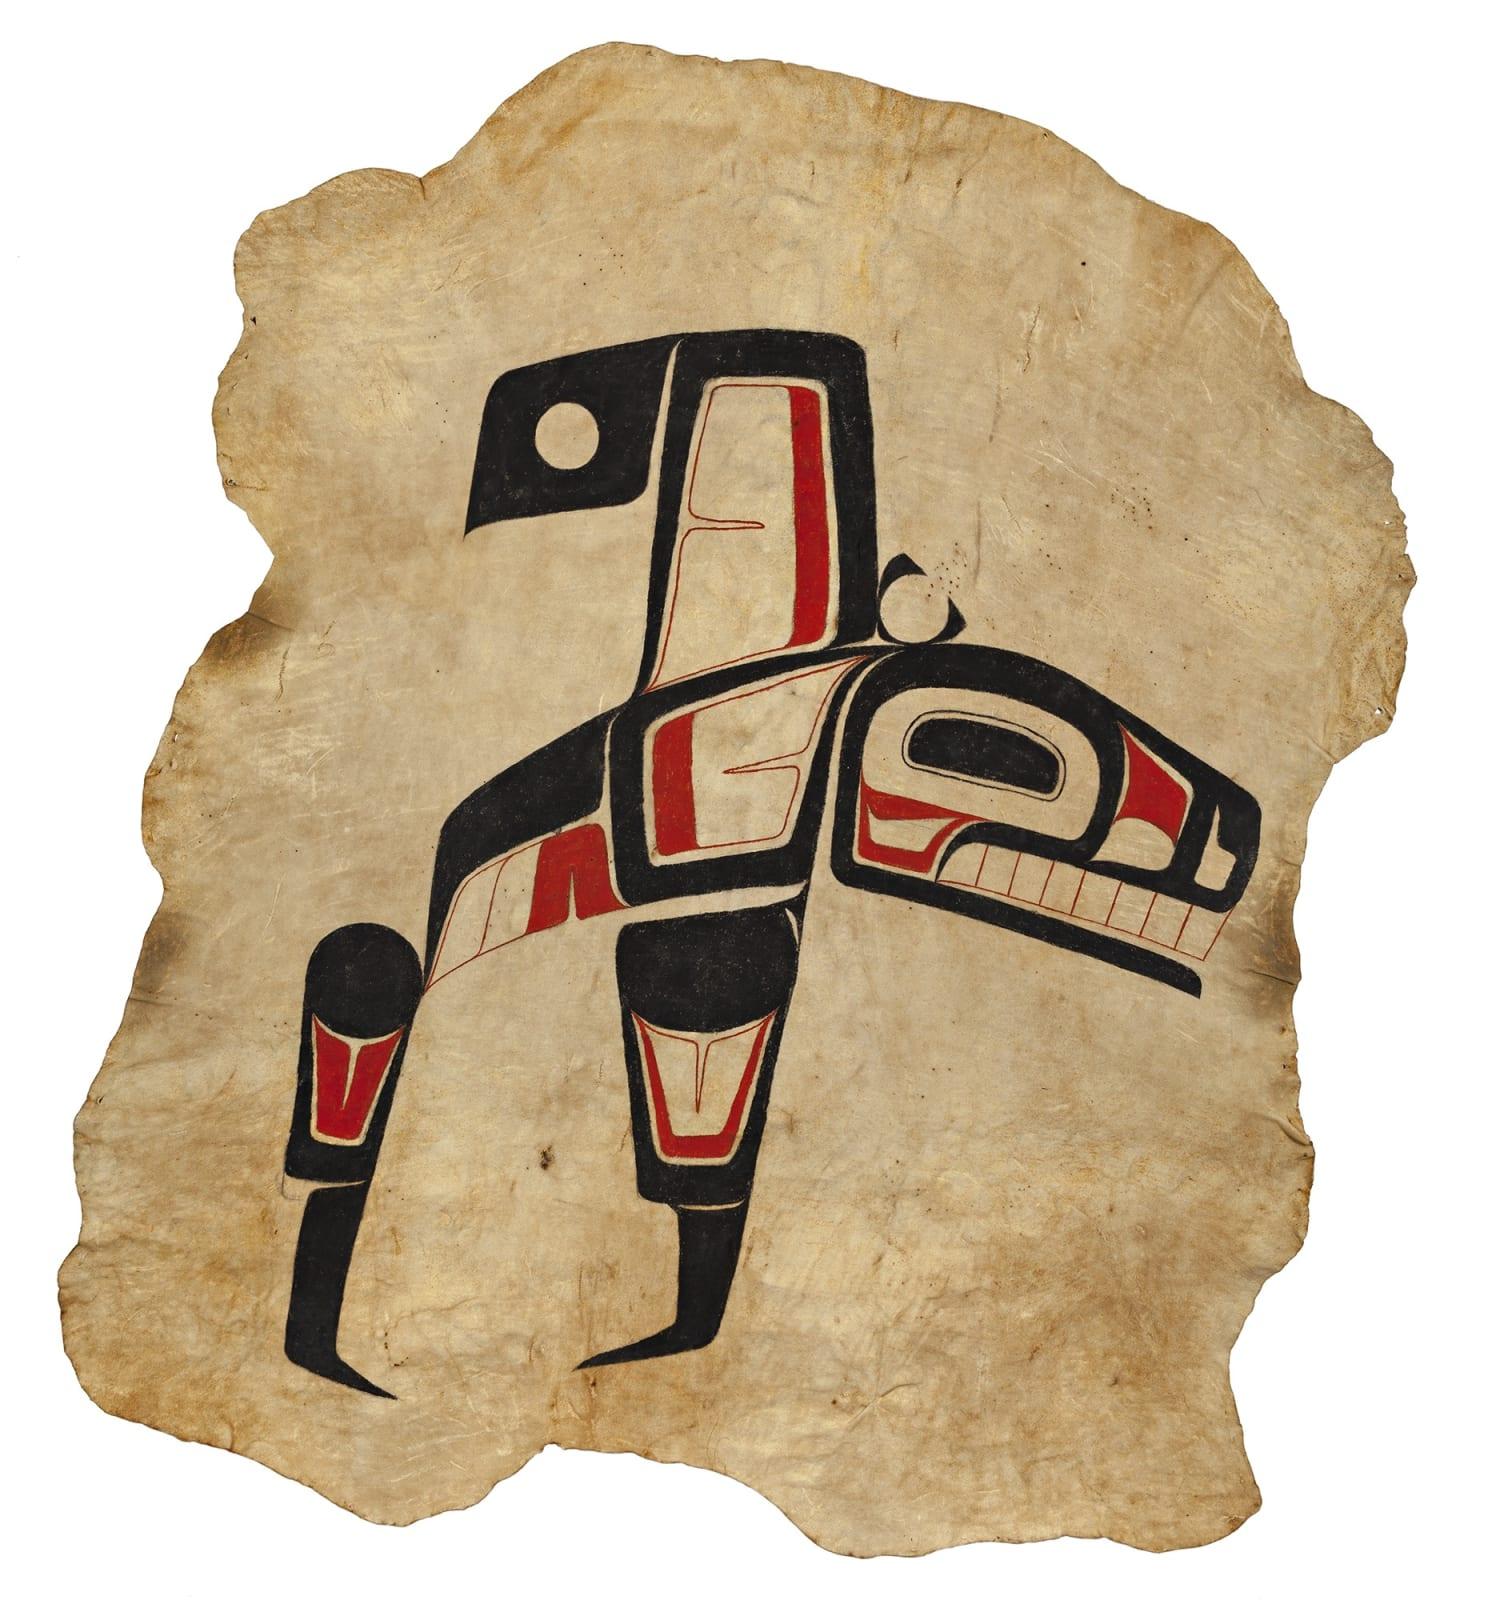 Lot 75 VERNON STEPHENS (1949-) GITXSAN (GITKSAN) Killer Whale, c. 1971 acrylic on tanned moose hide, 96 x 88 in (243.8 x 223.5 cm) Estimate: $4,000— $6,000